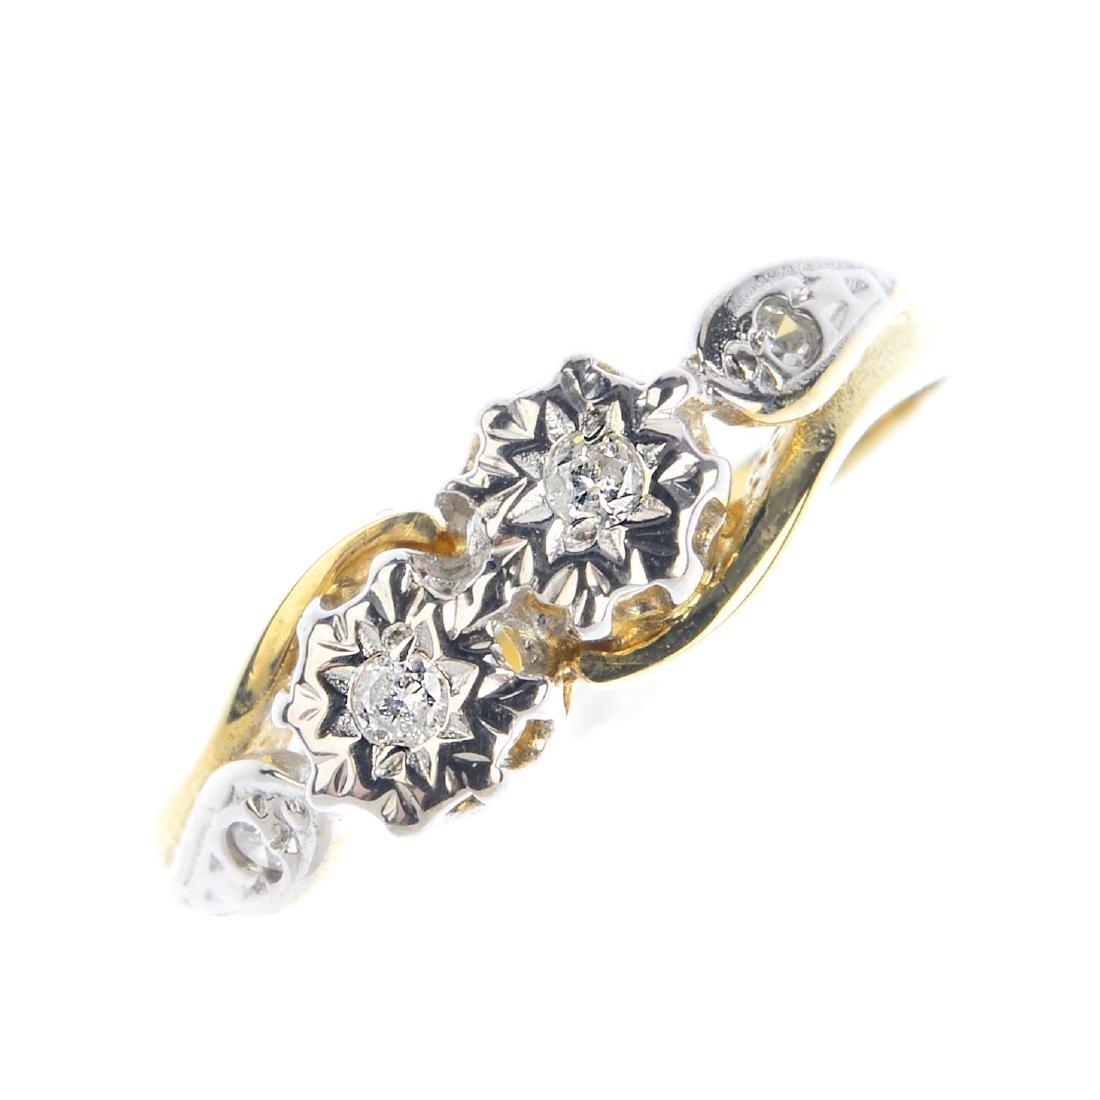 A 9ct gold diamond ring. Designed as a brilliant-cut